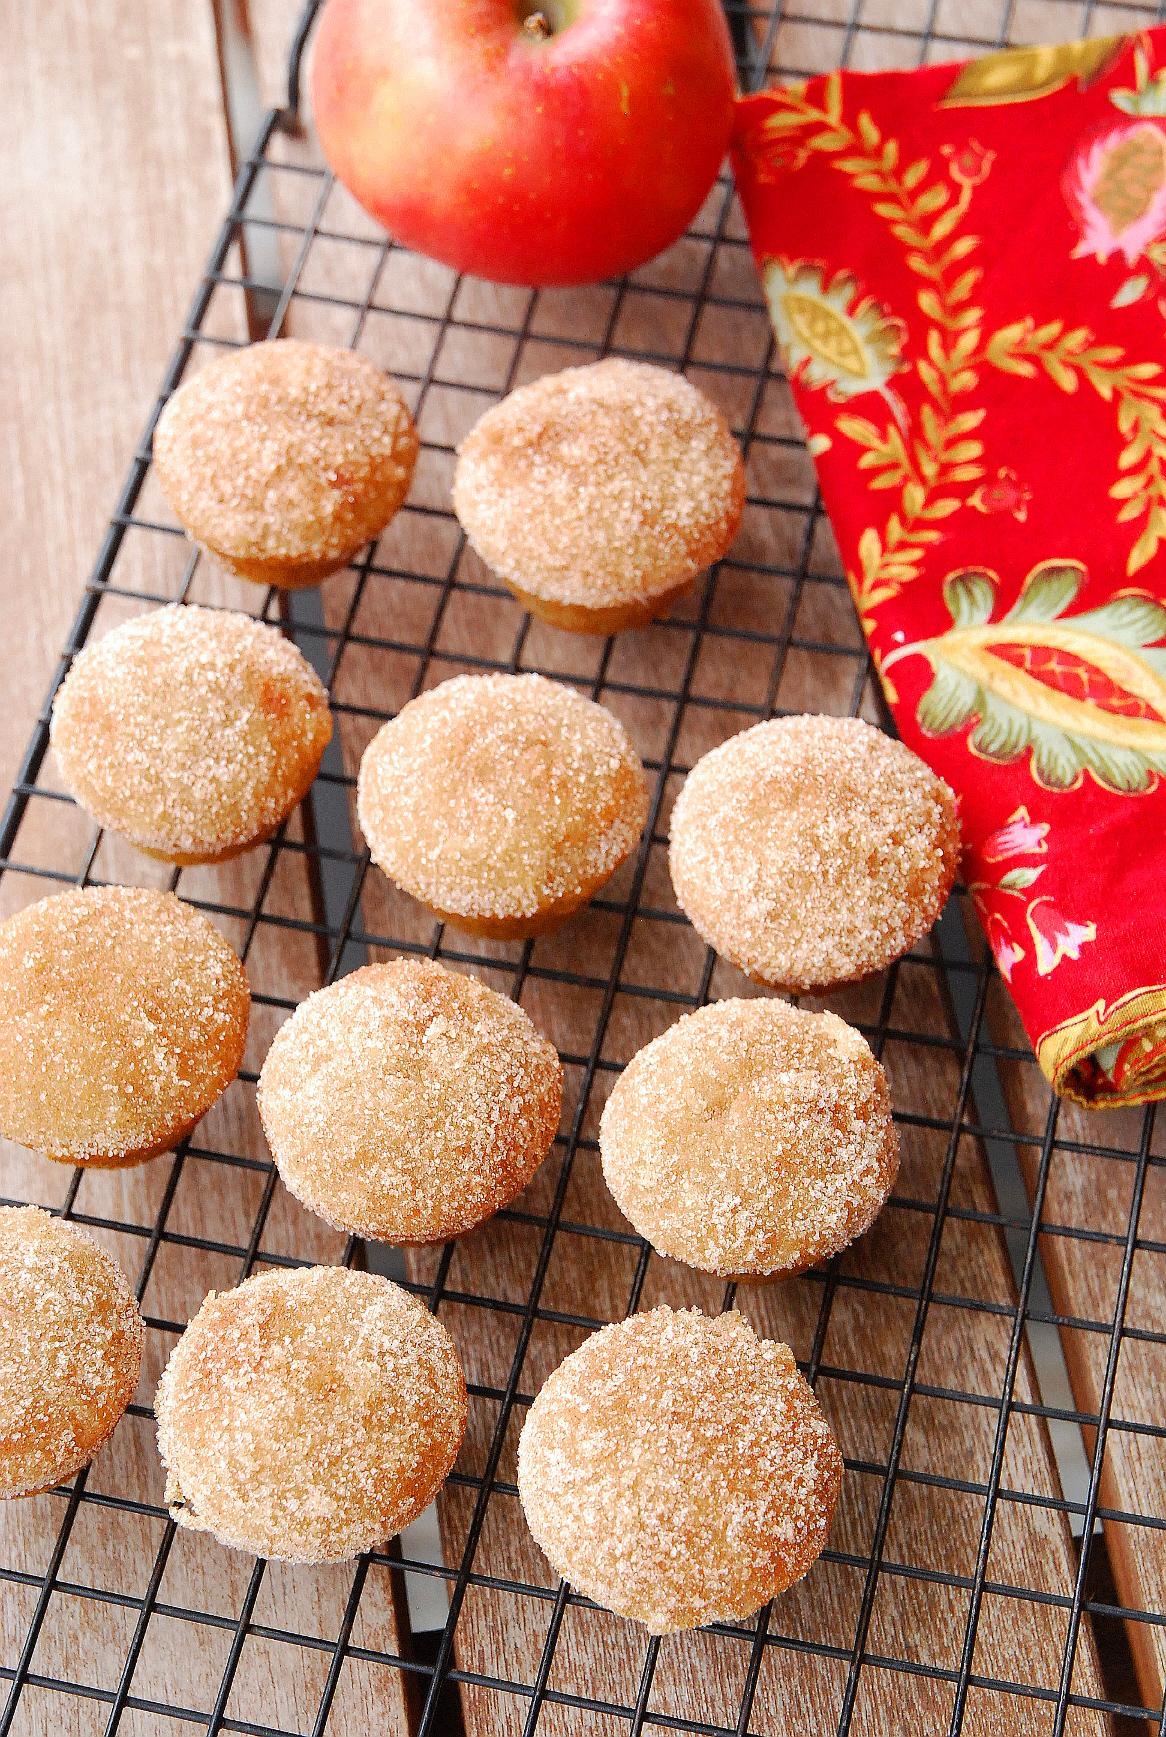 Apple Cider Cinna-Mini Muffins